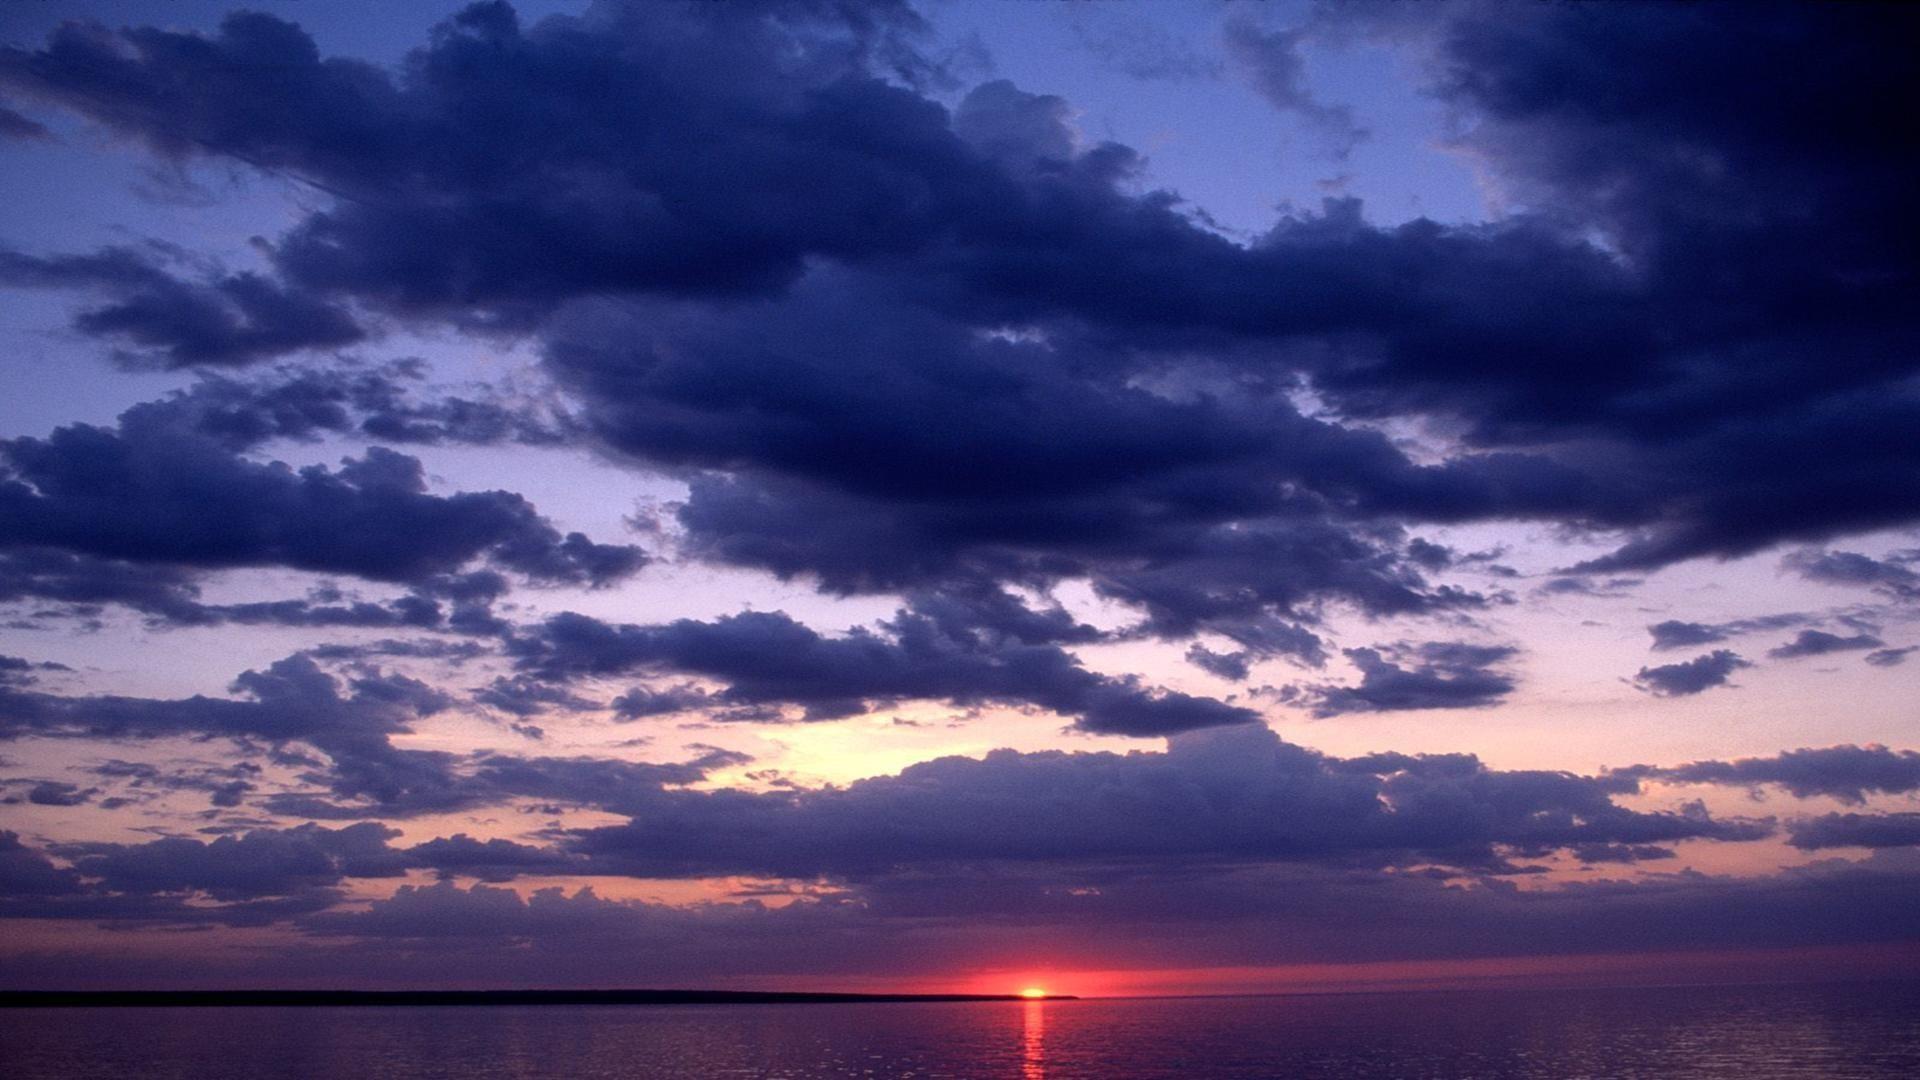 Protecting Dark Skies and the Creatures Below - Images